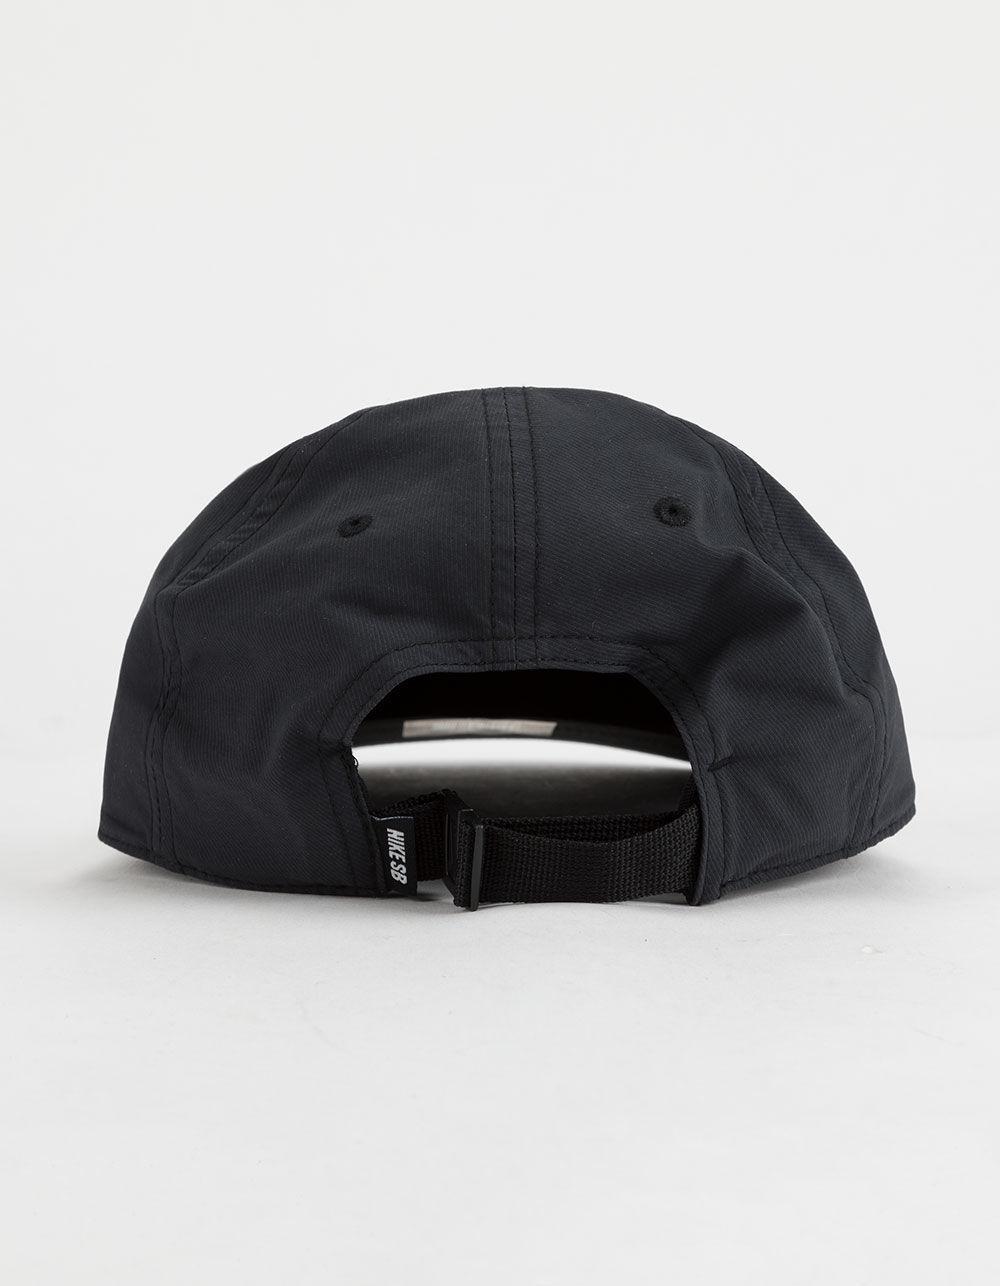 96148c419a1ae Lyst - Nike Dri-fit Heritage 86 Flat Black Mens Strapback Hat in Black